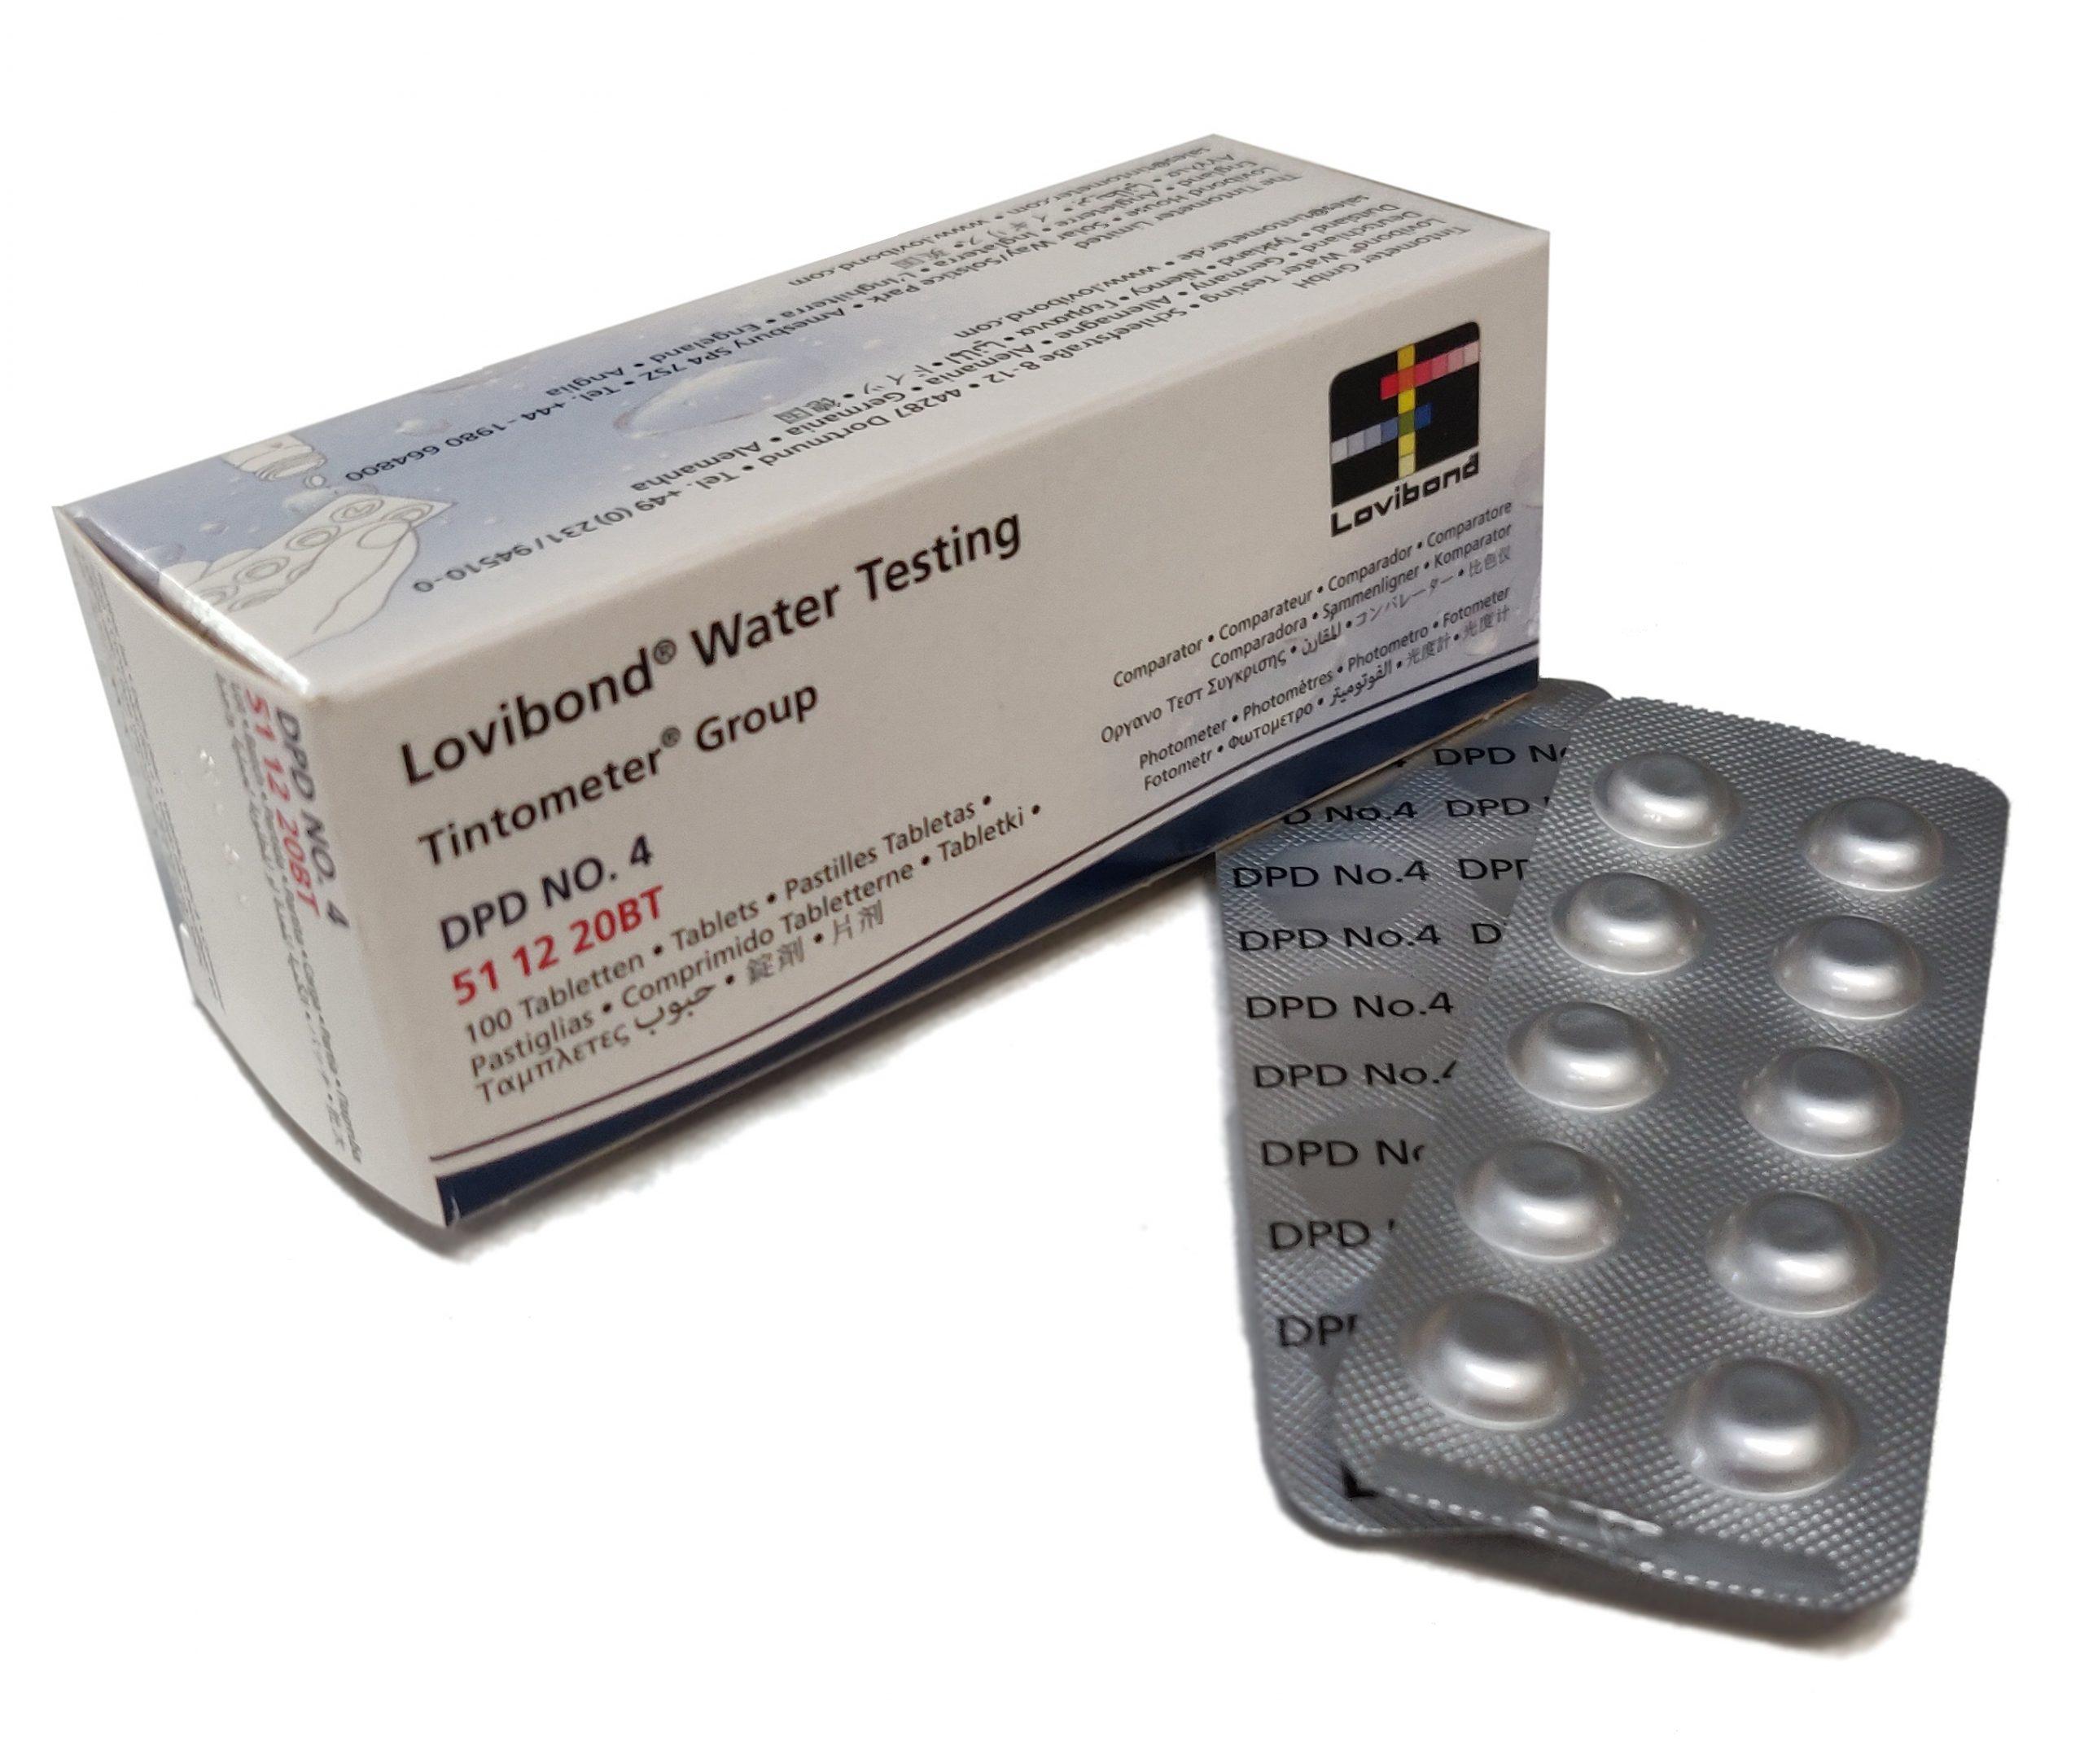 DPD nr. 4 Aktiv Oxygen 0,1-10 mg/l (Photometer)